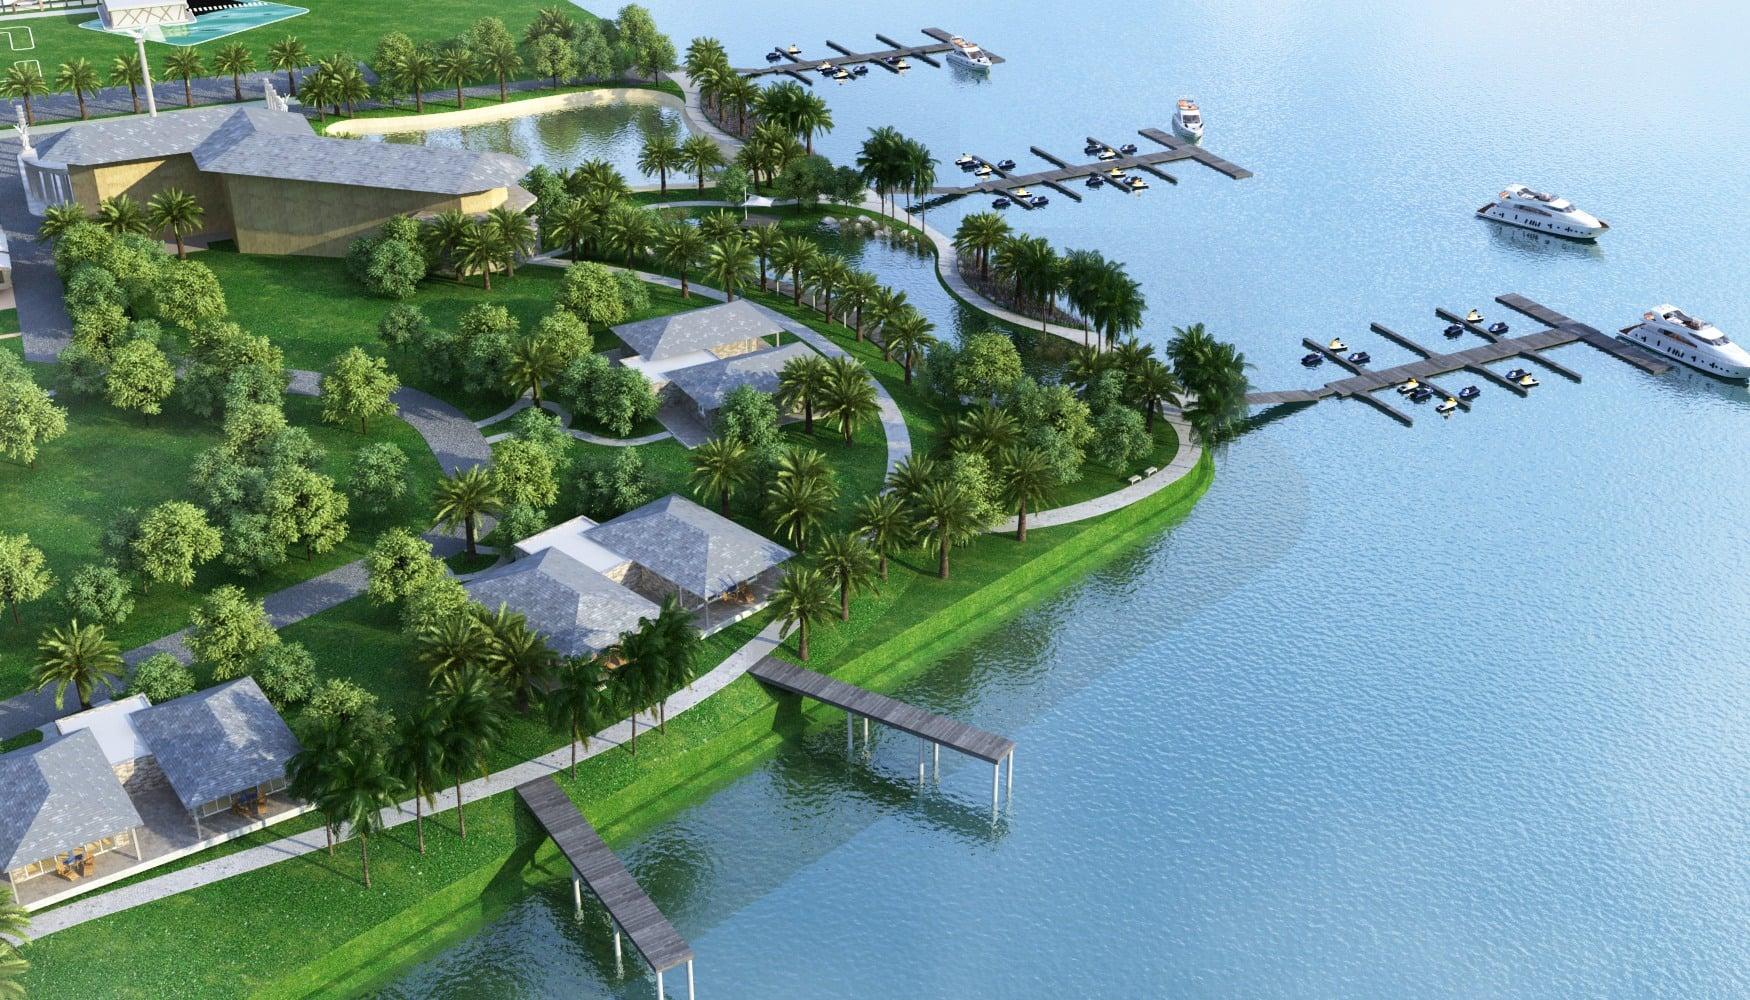 Palm Marina Novaland quan 9 - DỰ ÁN PALM MARINA NOVALAND QUẬN 9